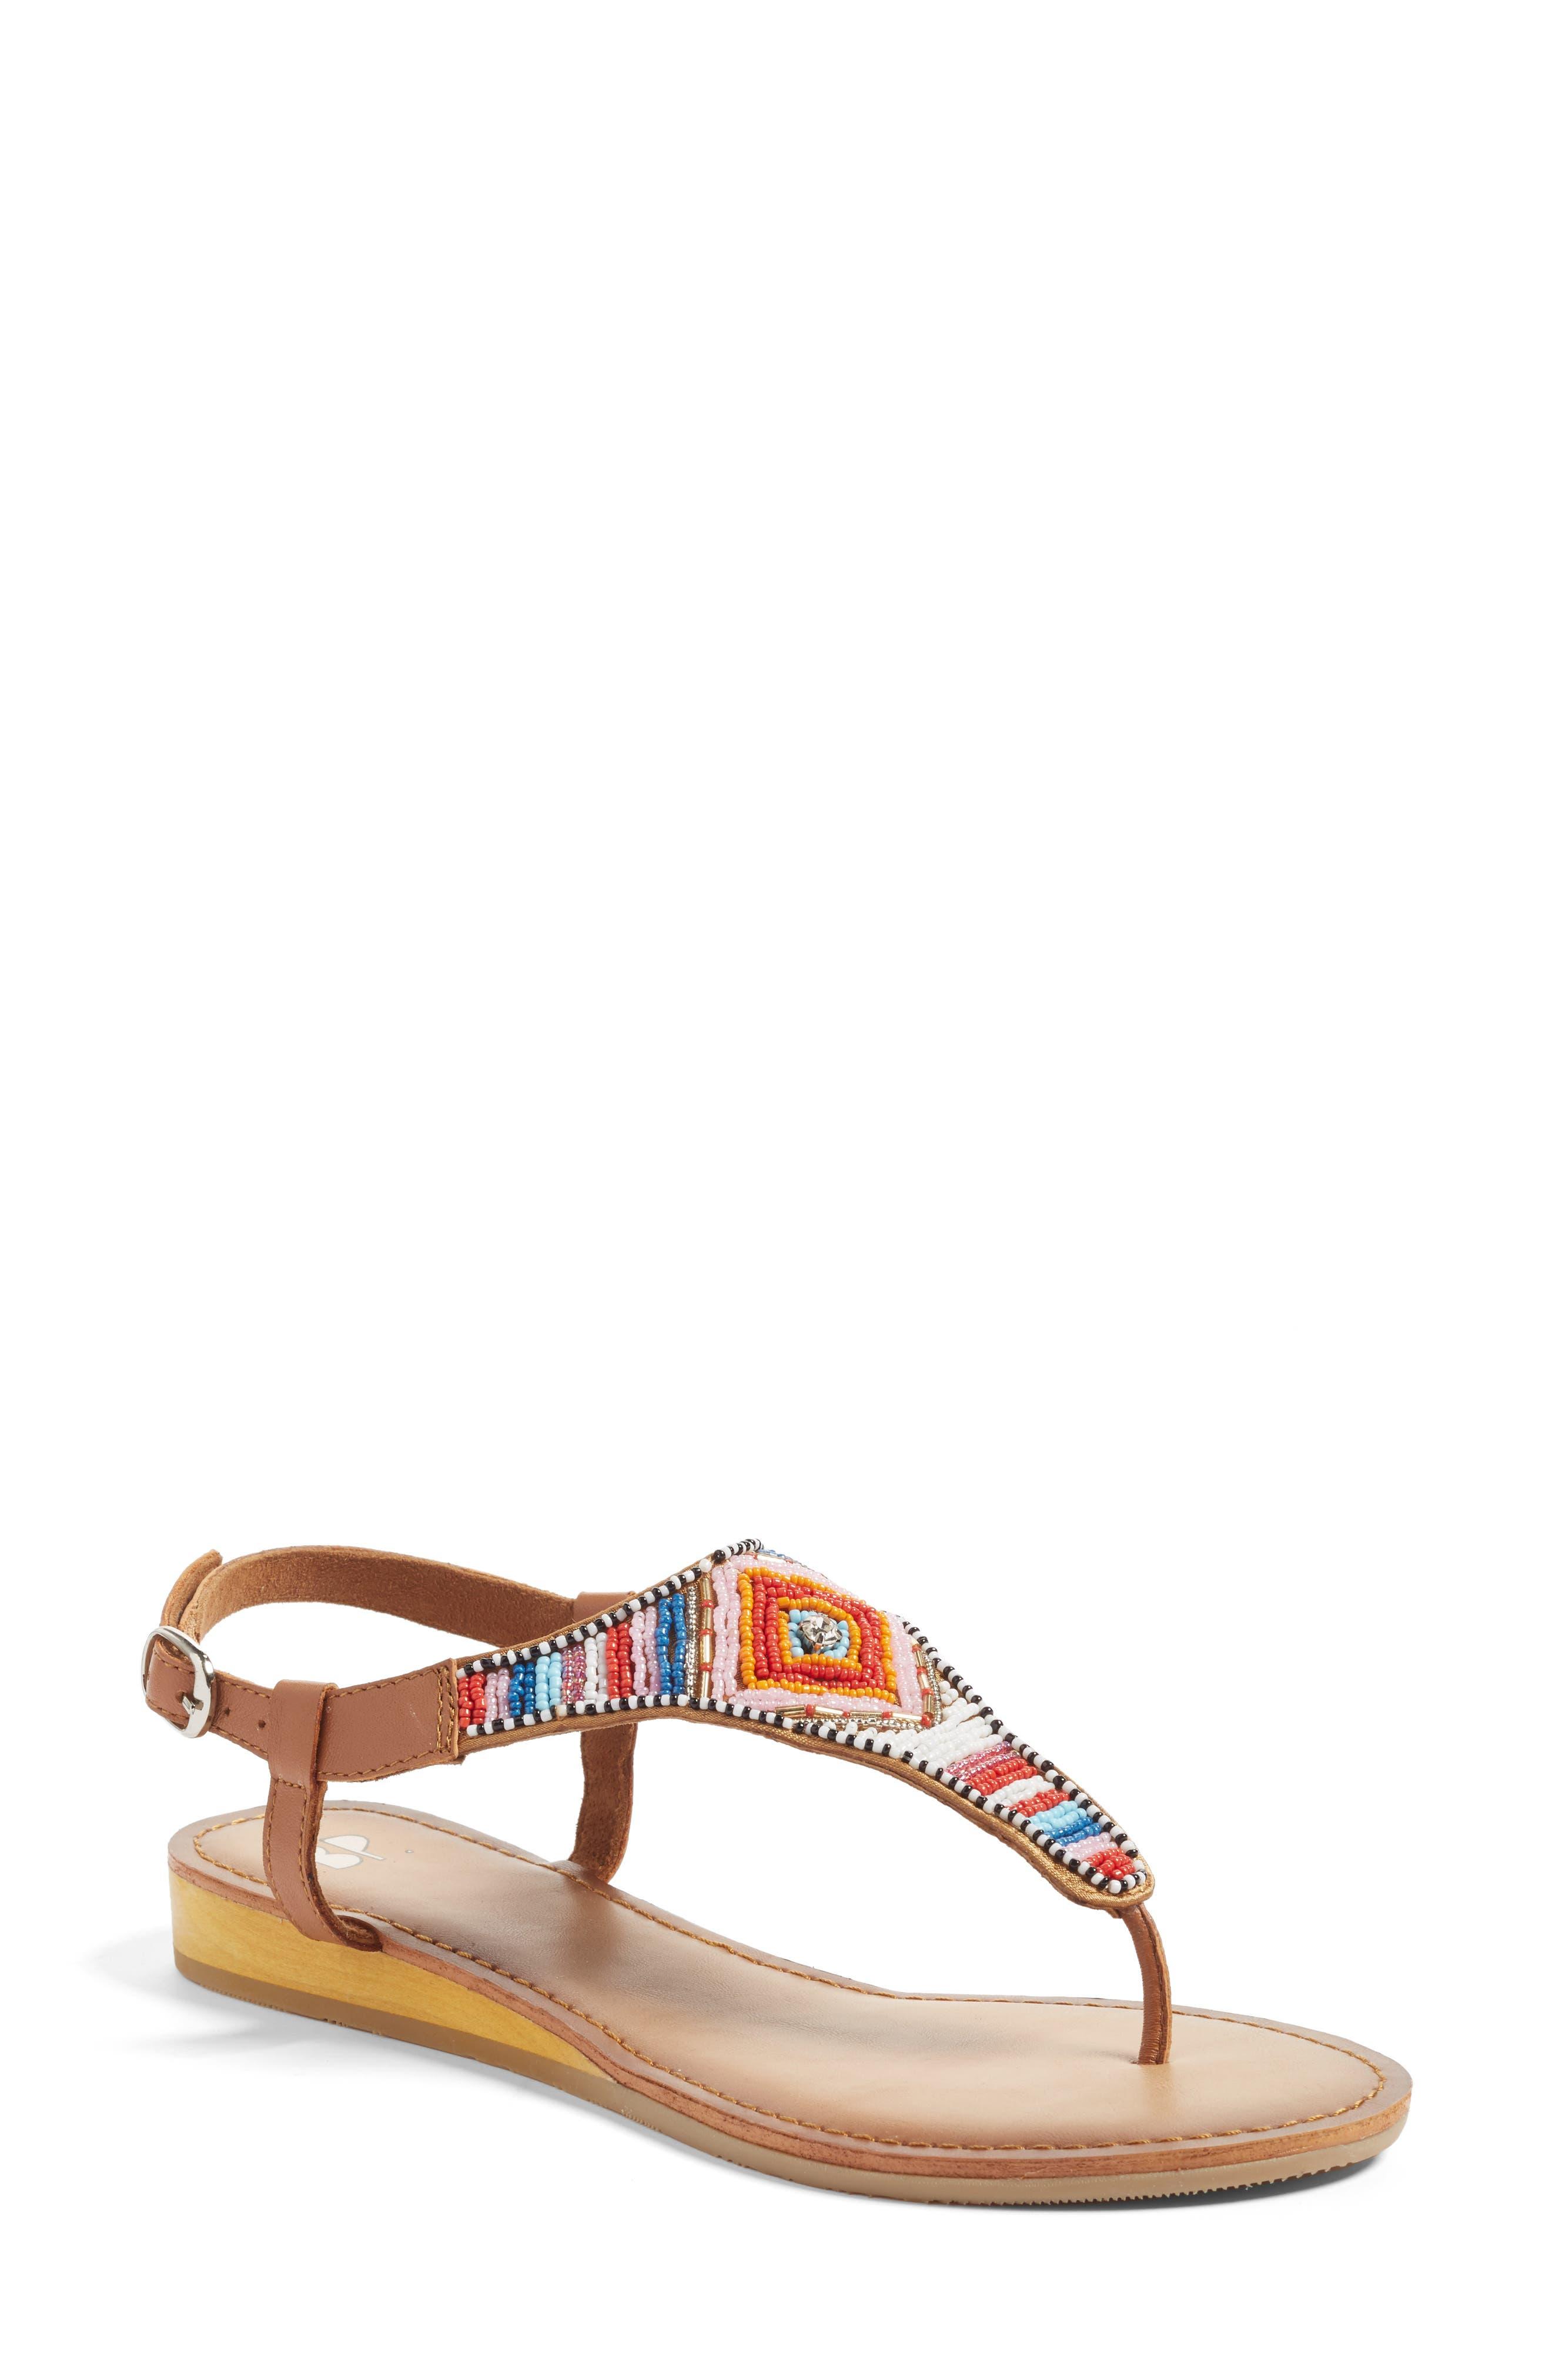 Zandra Beaded V-Strap Sandal,                             Main thumbnail 1, color,                             200